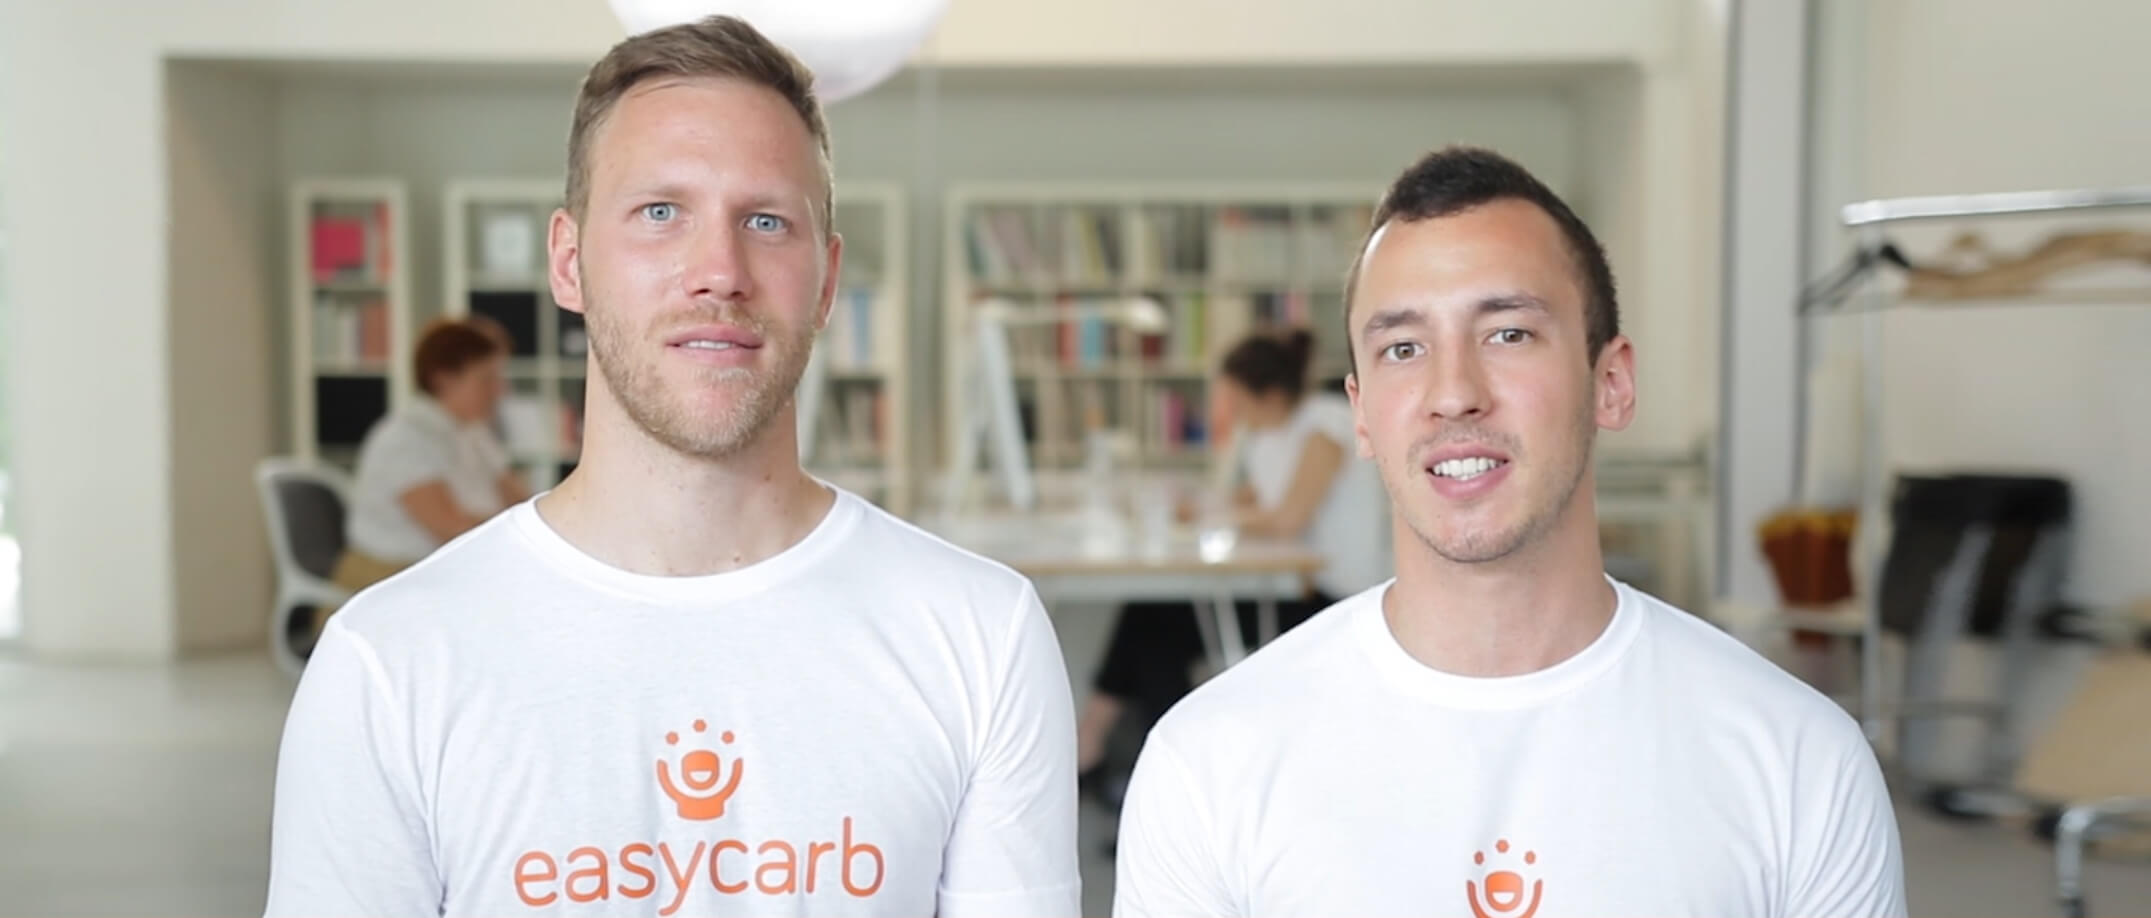 Klemen Zupancic and Luka Zupancic Easycarb